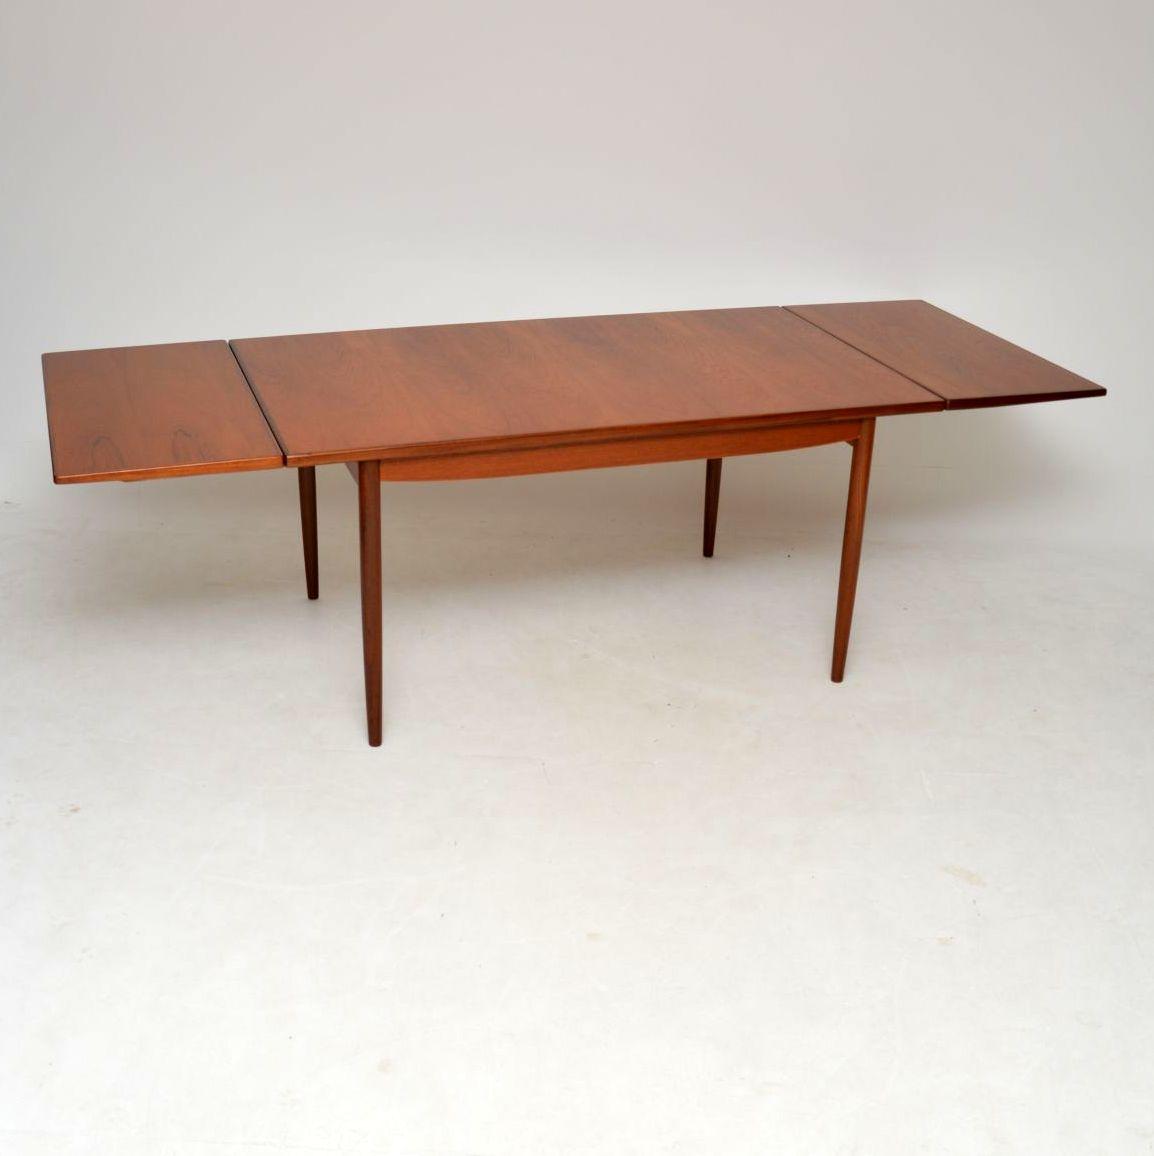 danish_teak_retro_vintage_dining_table_kofod_larsen_4